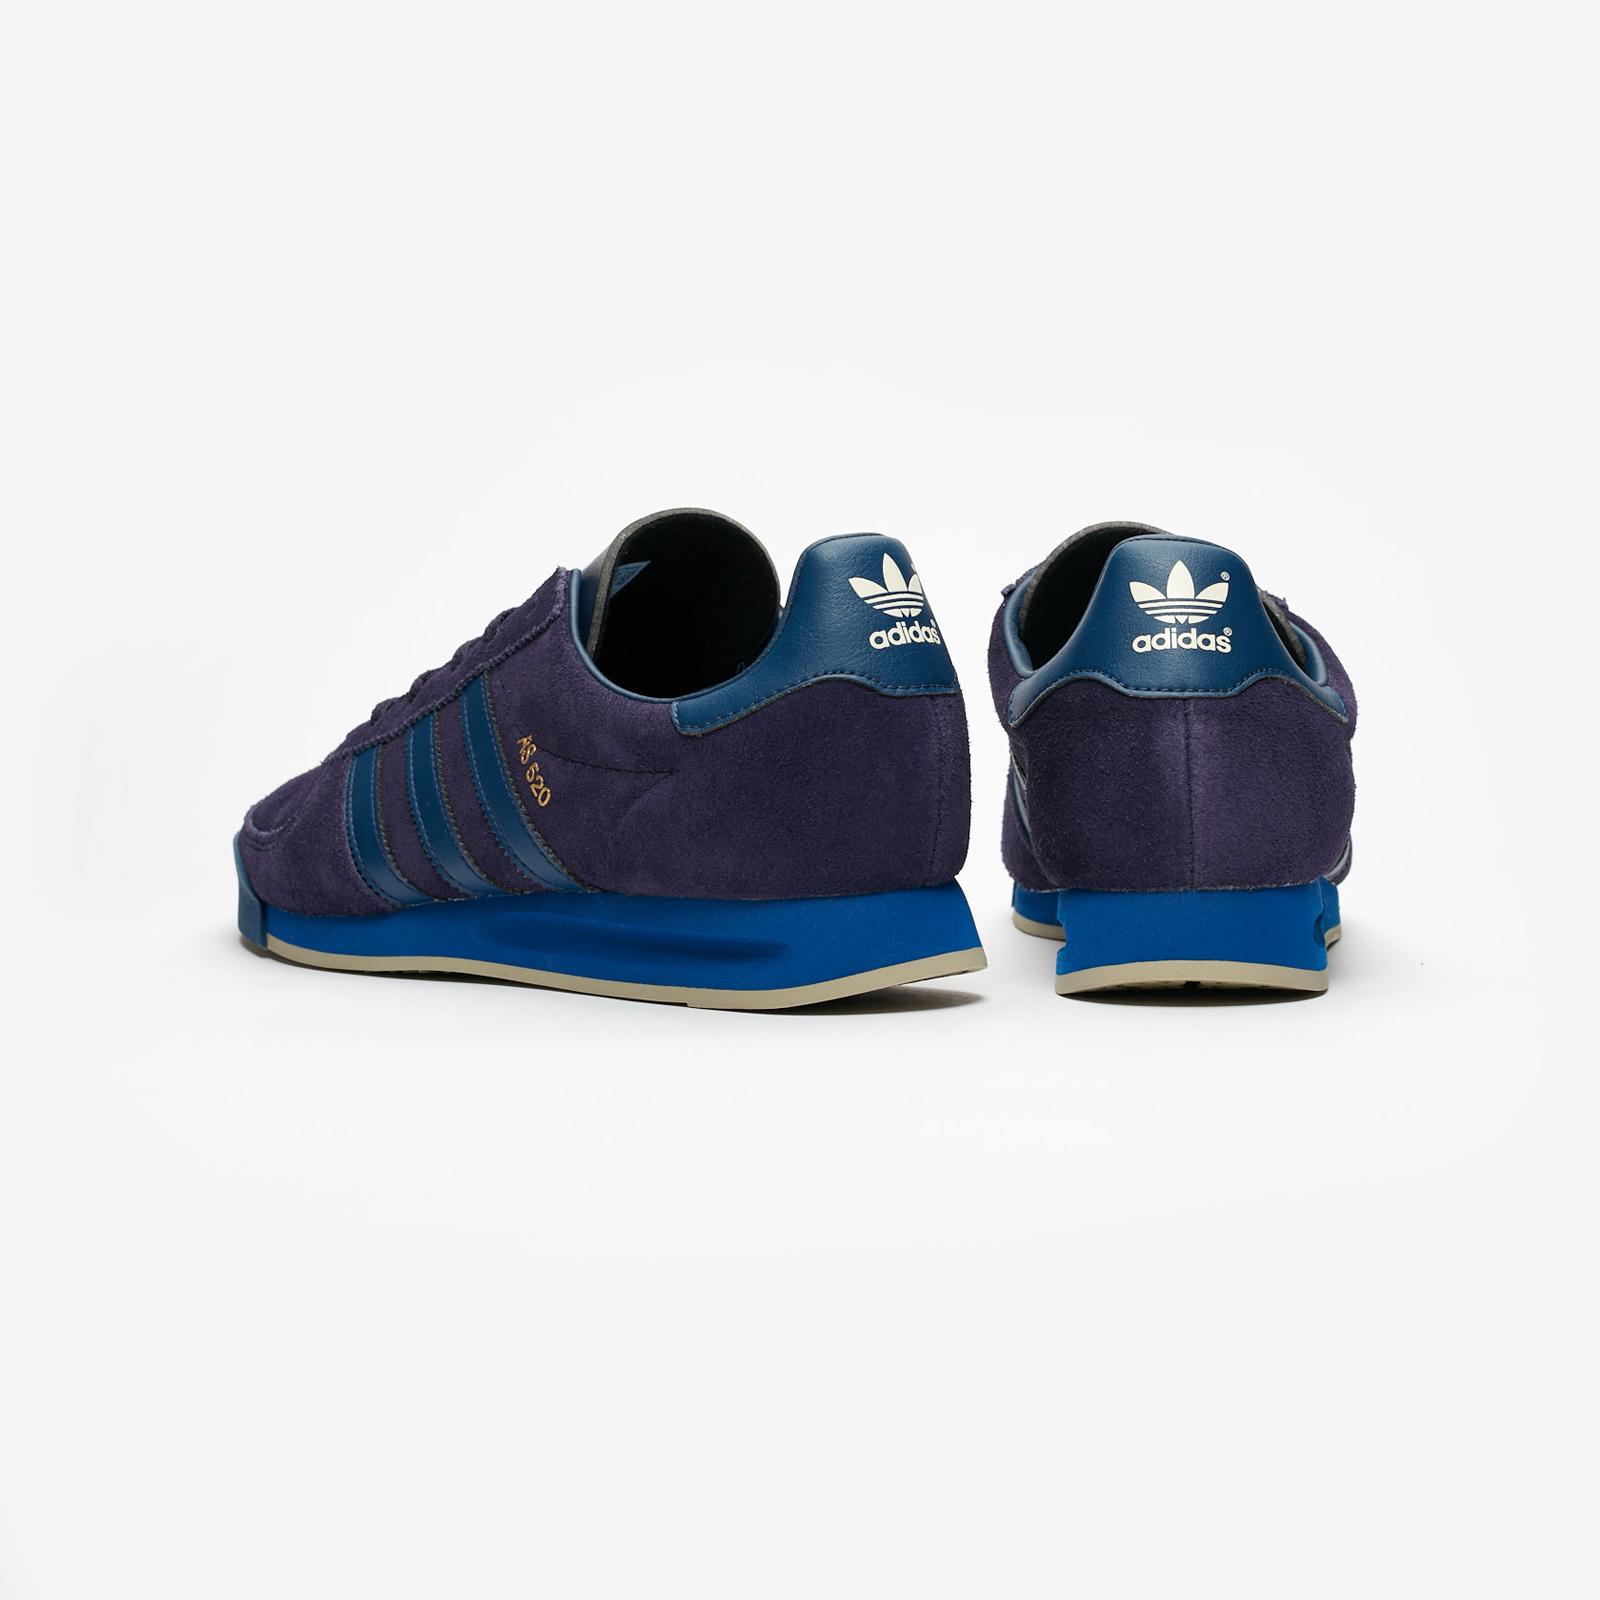 adidas AS 520 - F35711 - Sneakersnstuff